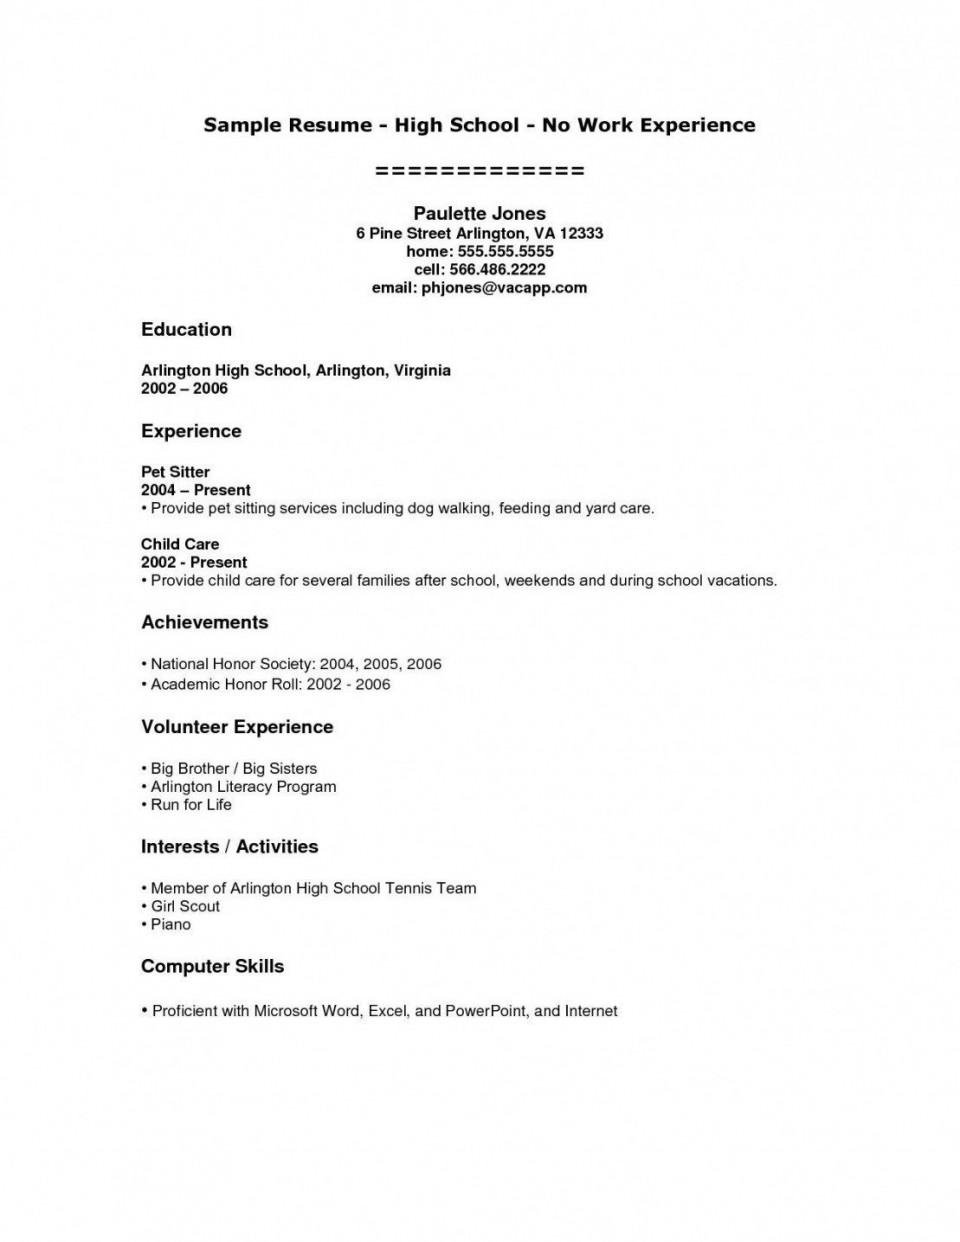 008 Shocking High School Student Resume Template Inspiration  Free Google Doc960